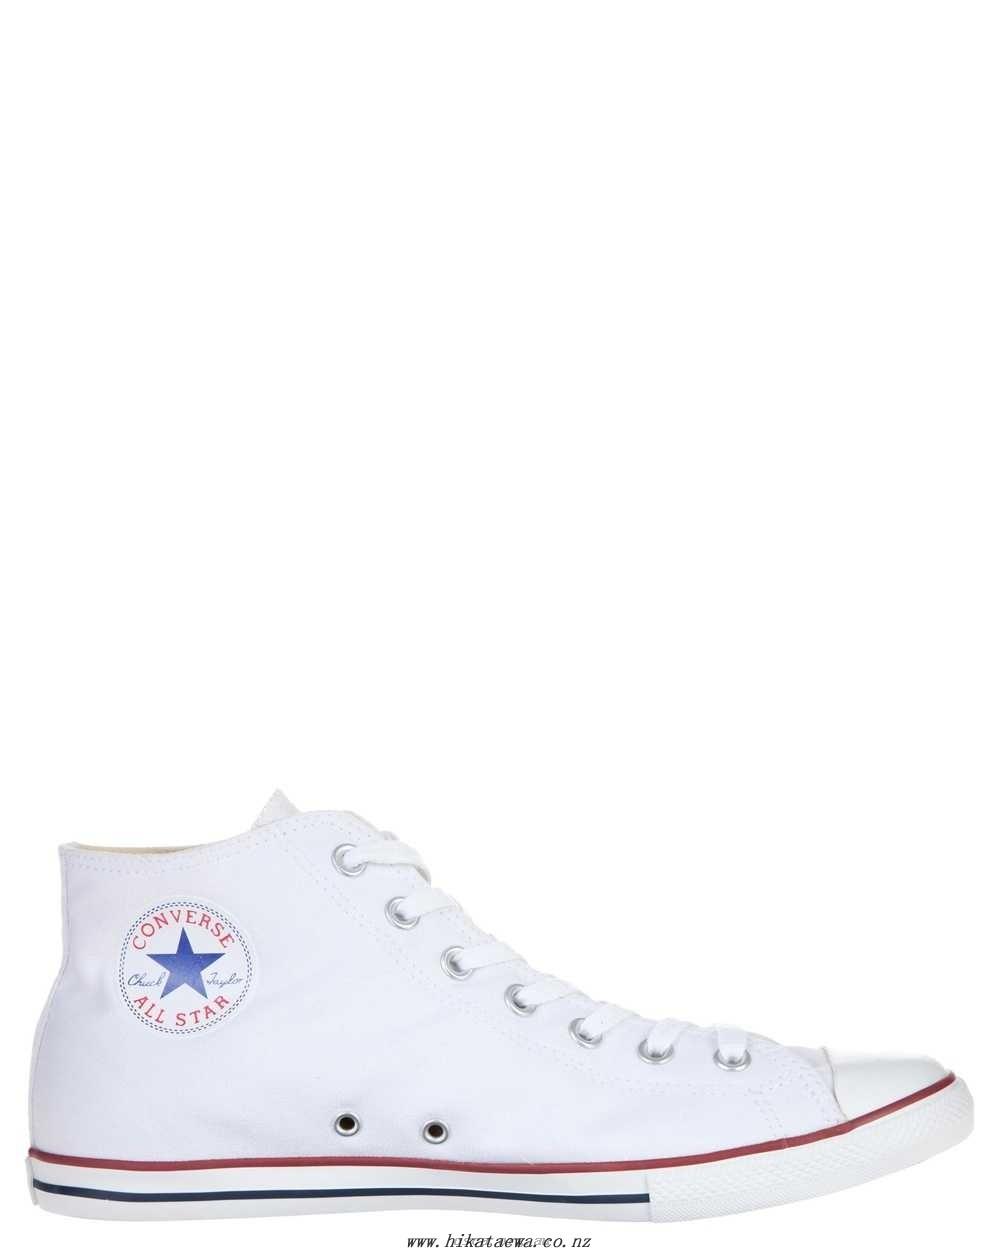 1000x1250 Converse Sneakers,timberland,mizuno,new Balance,converse,,united